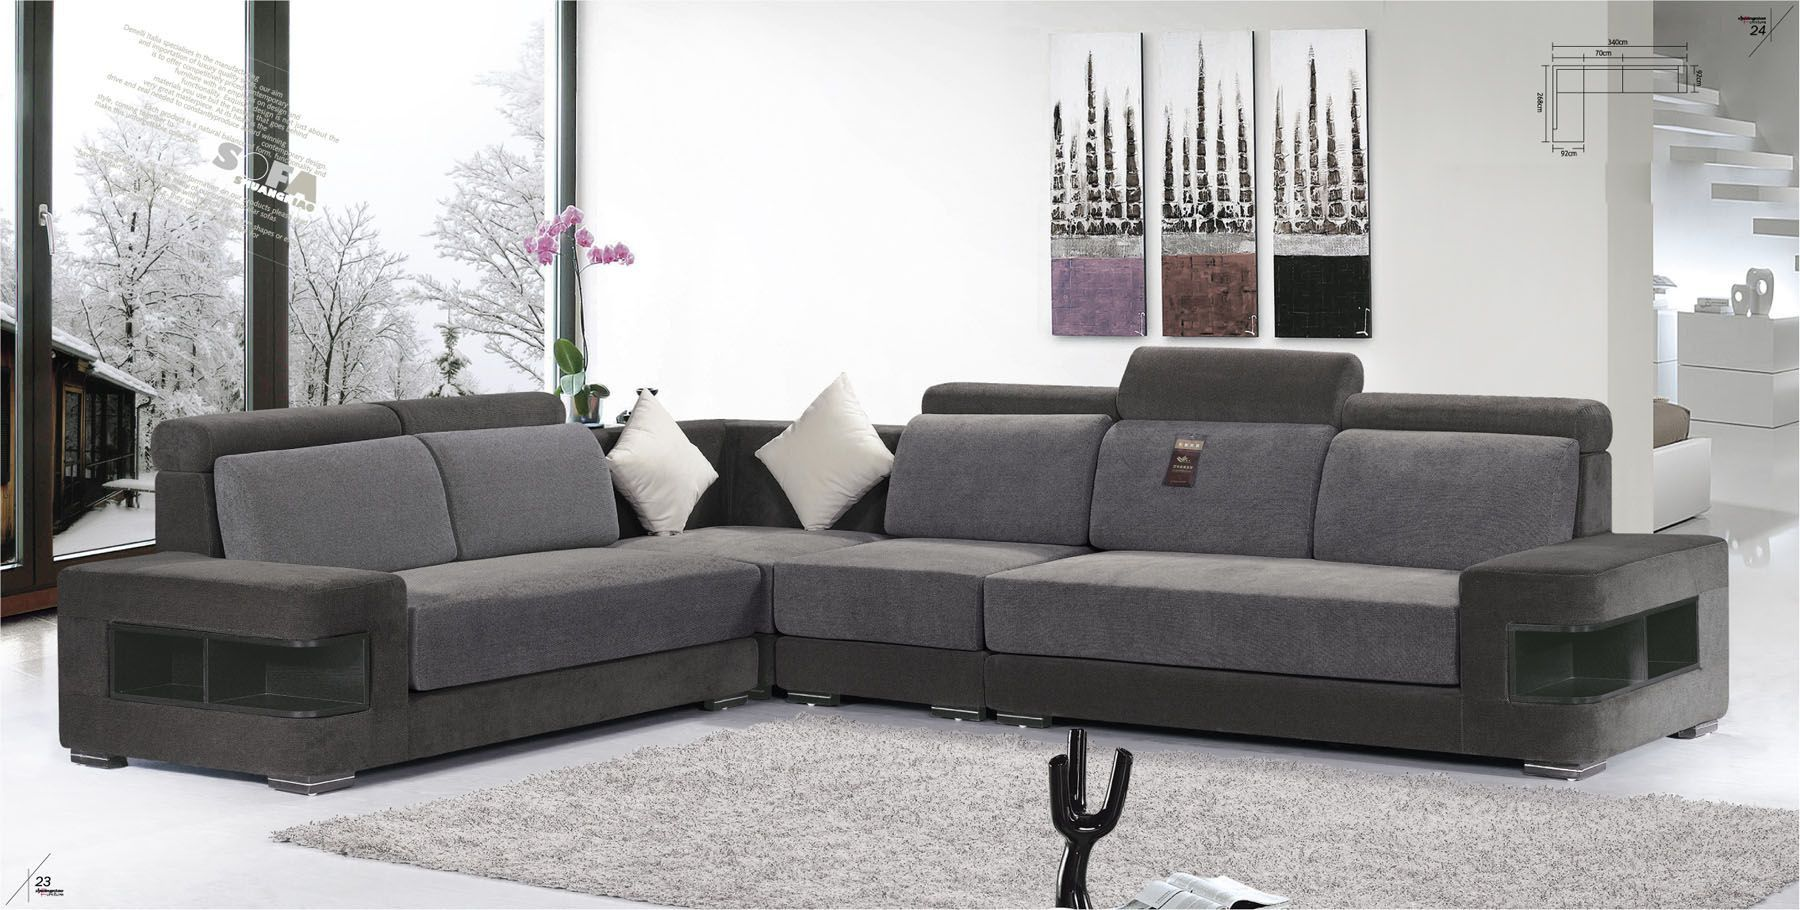 Modern Modern L Shaped Sofa Inspirational Modern L Shaped Sofa 56 For Living Room Inspiration With Modern L Shaped Sofa Sofa Design Living Room Sofa Sofa Set